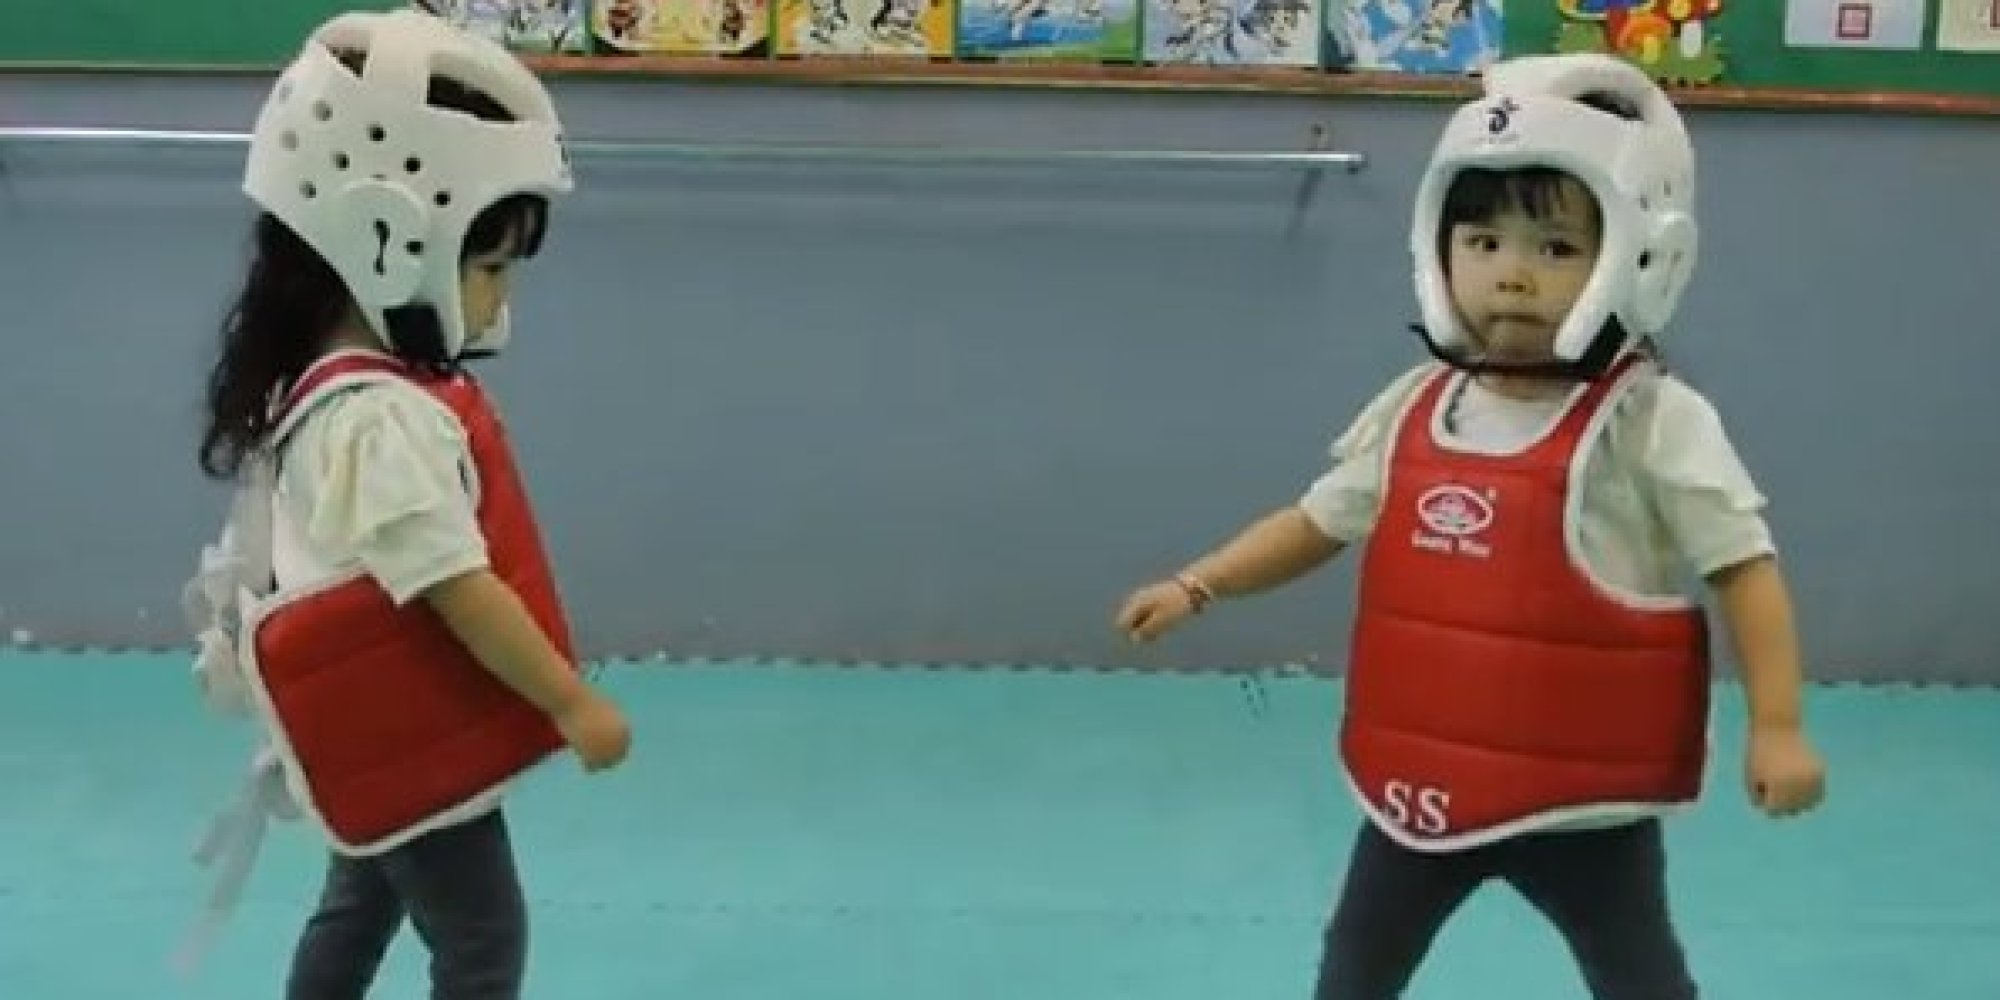 Toddler taekwondo